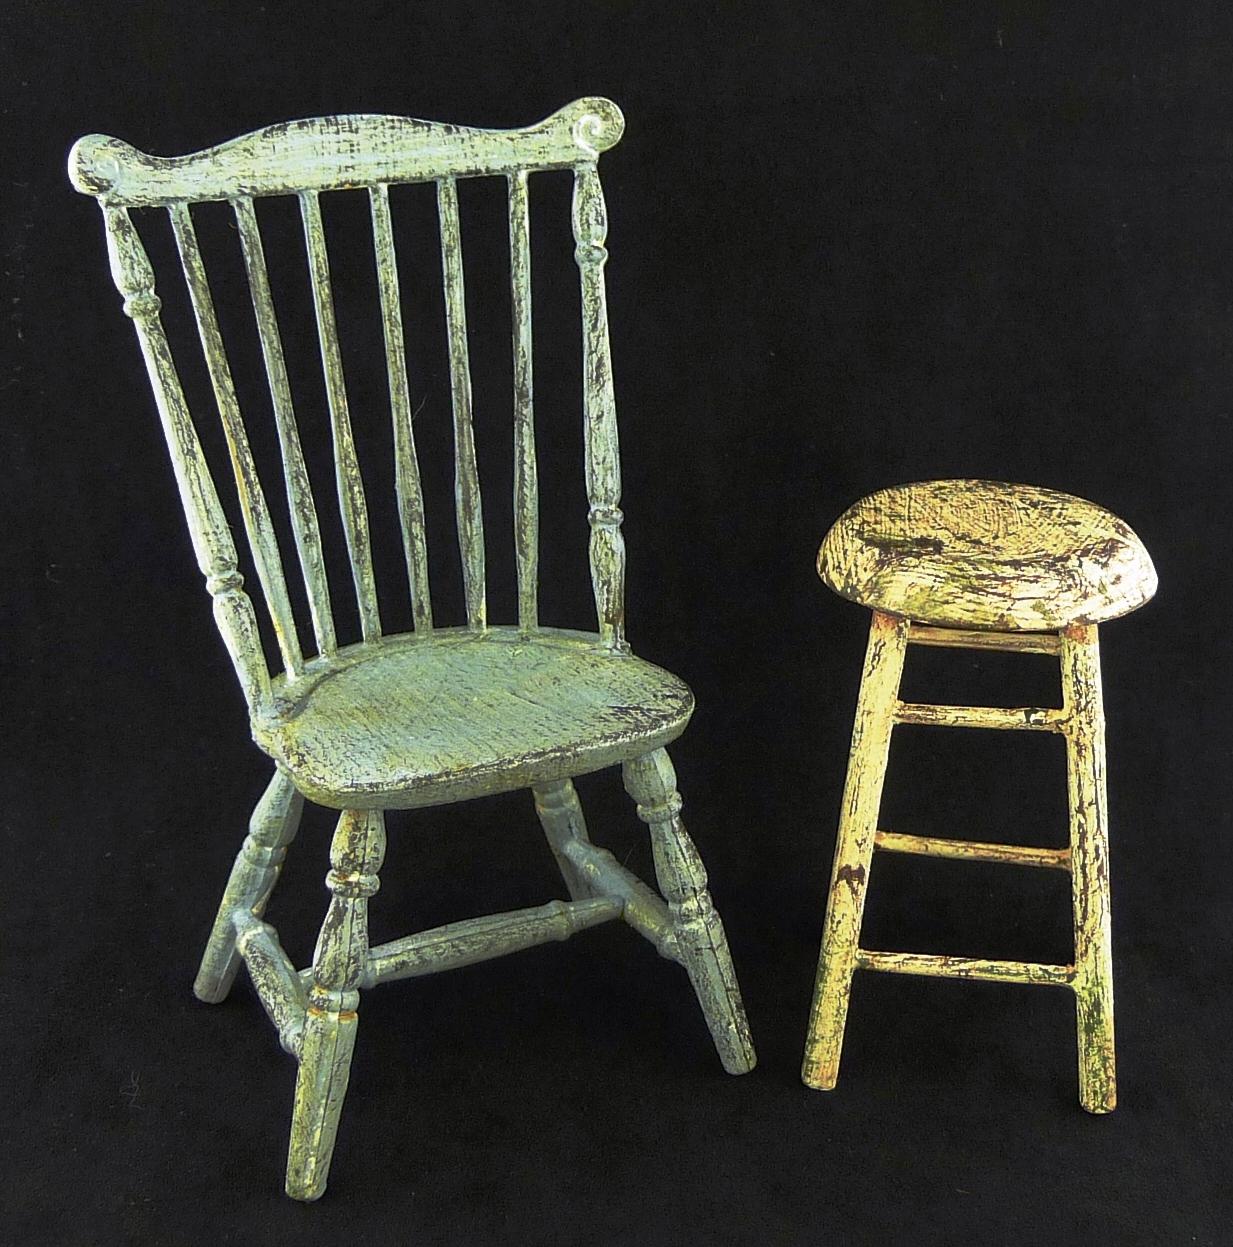 Beau Aged Chair U0026 Stool